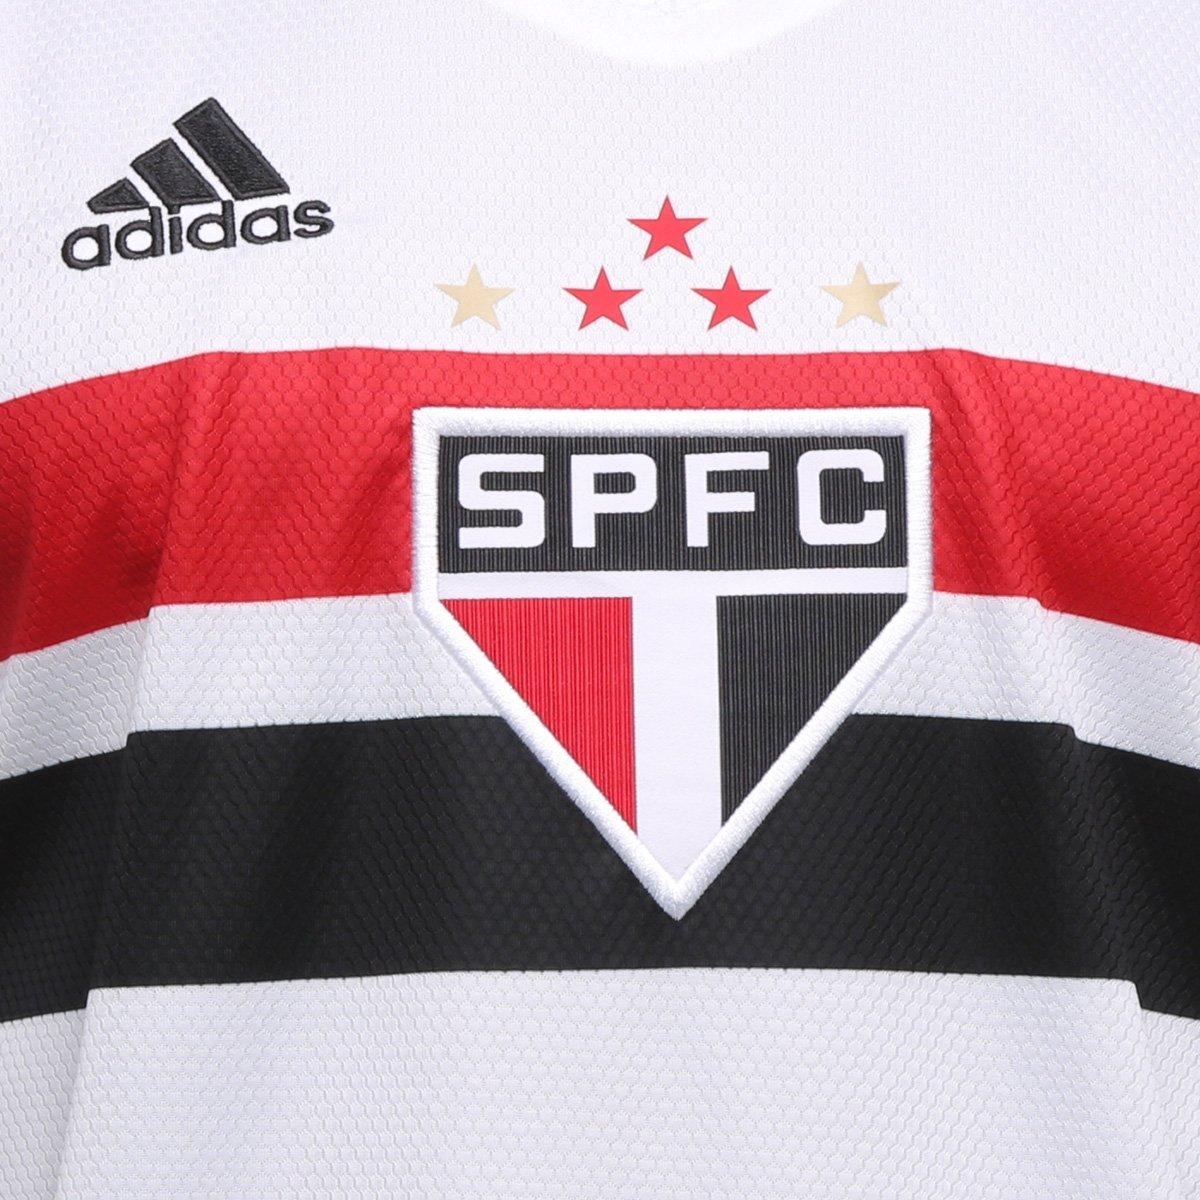 CAMISA CLUBE ADIDAS SAO PAULO I 2021 GK9828 BRANCO MASCULINO